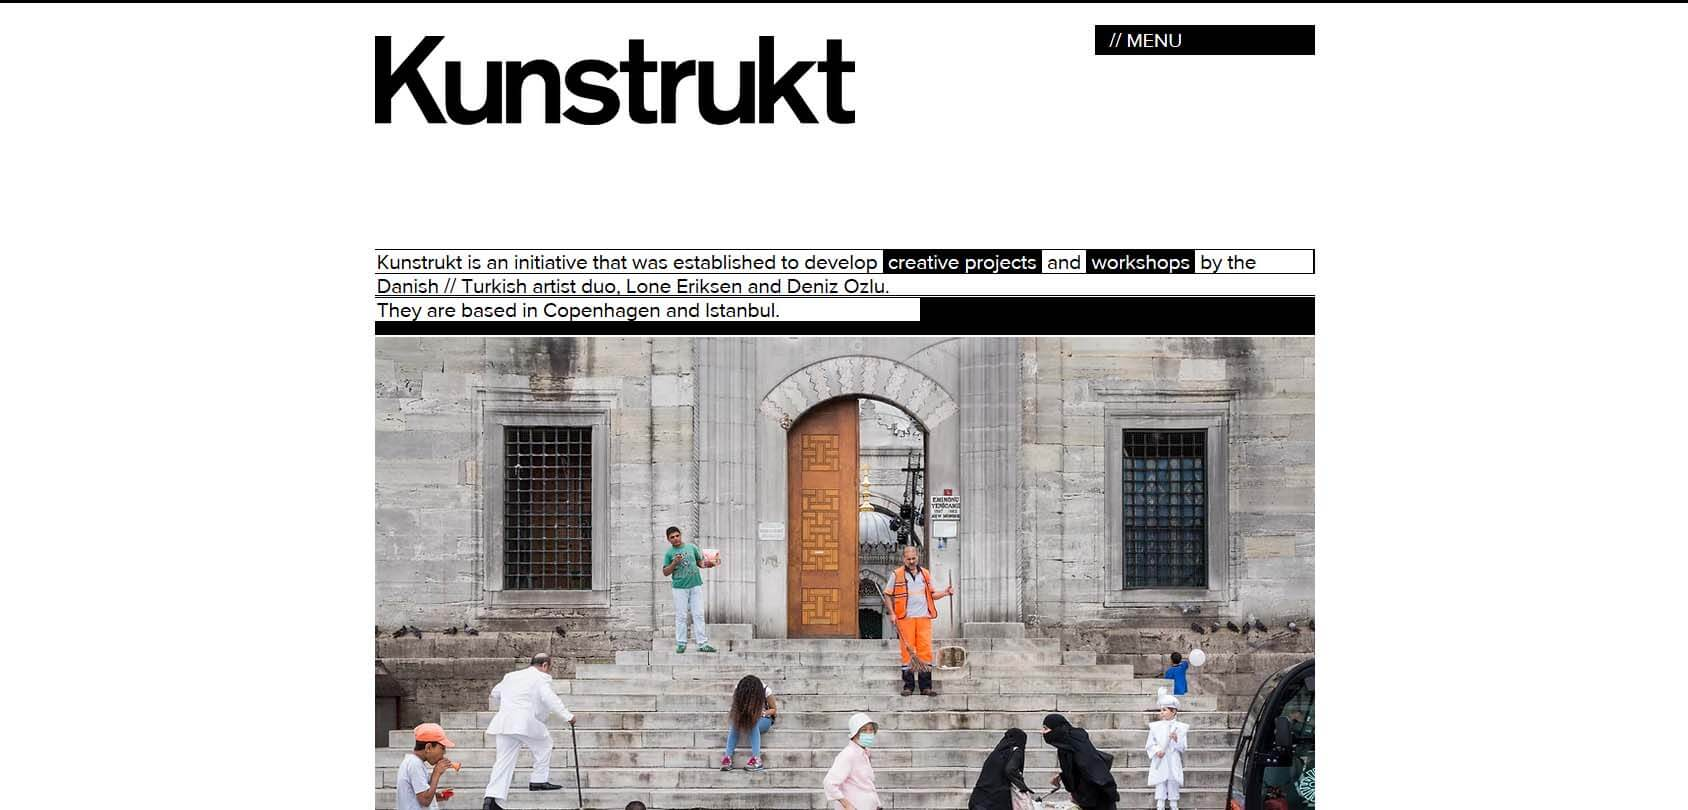 Kunstrukt Homepage